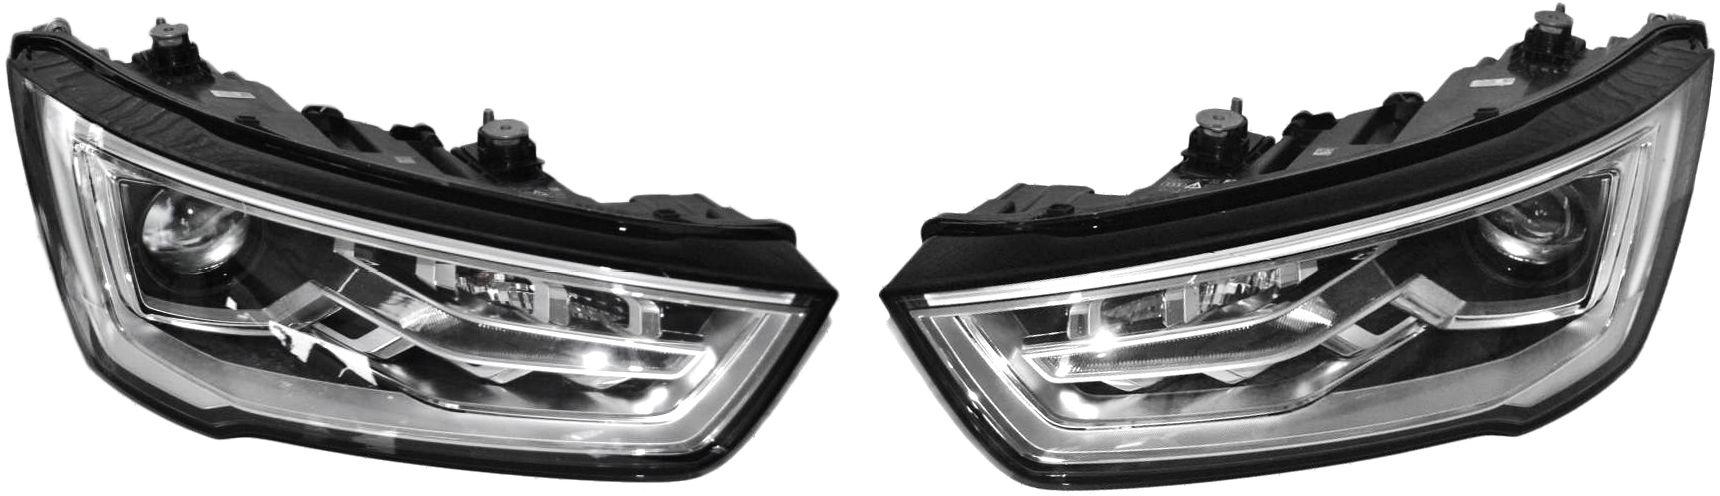 2x Nowe Kompletne Reflektory Lampy Bixenon Xenon Led Do Audi A1 S1 8X Facelift 8XA941005